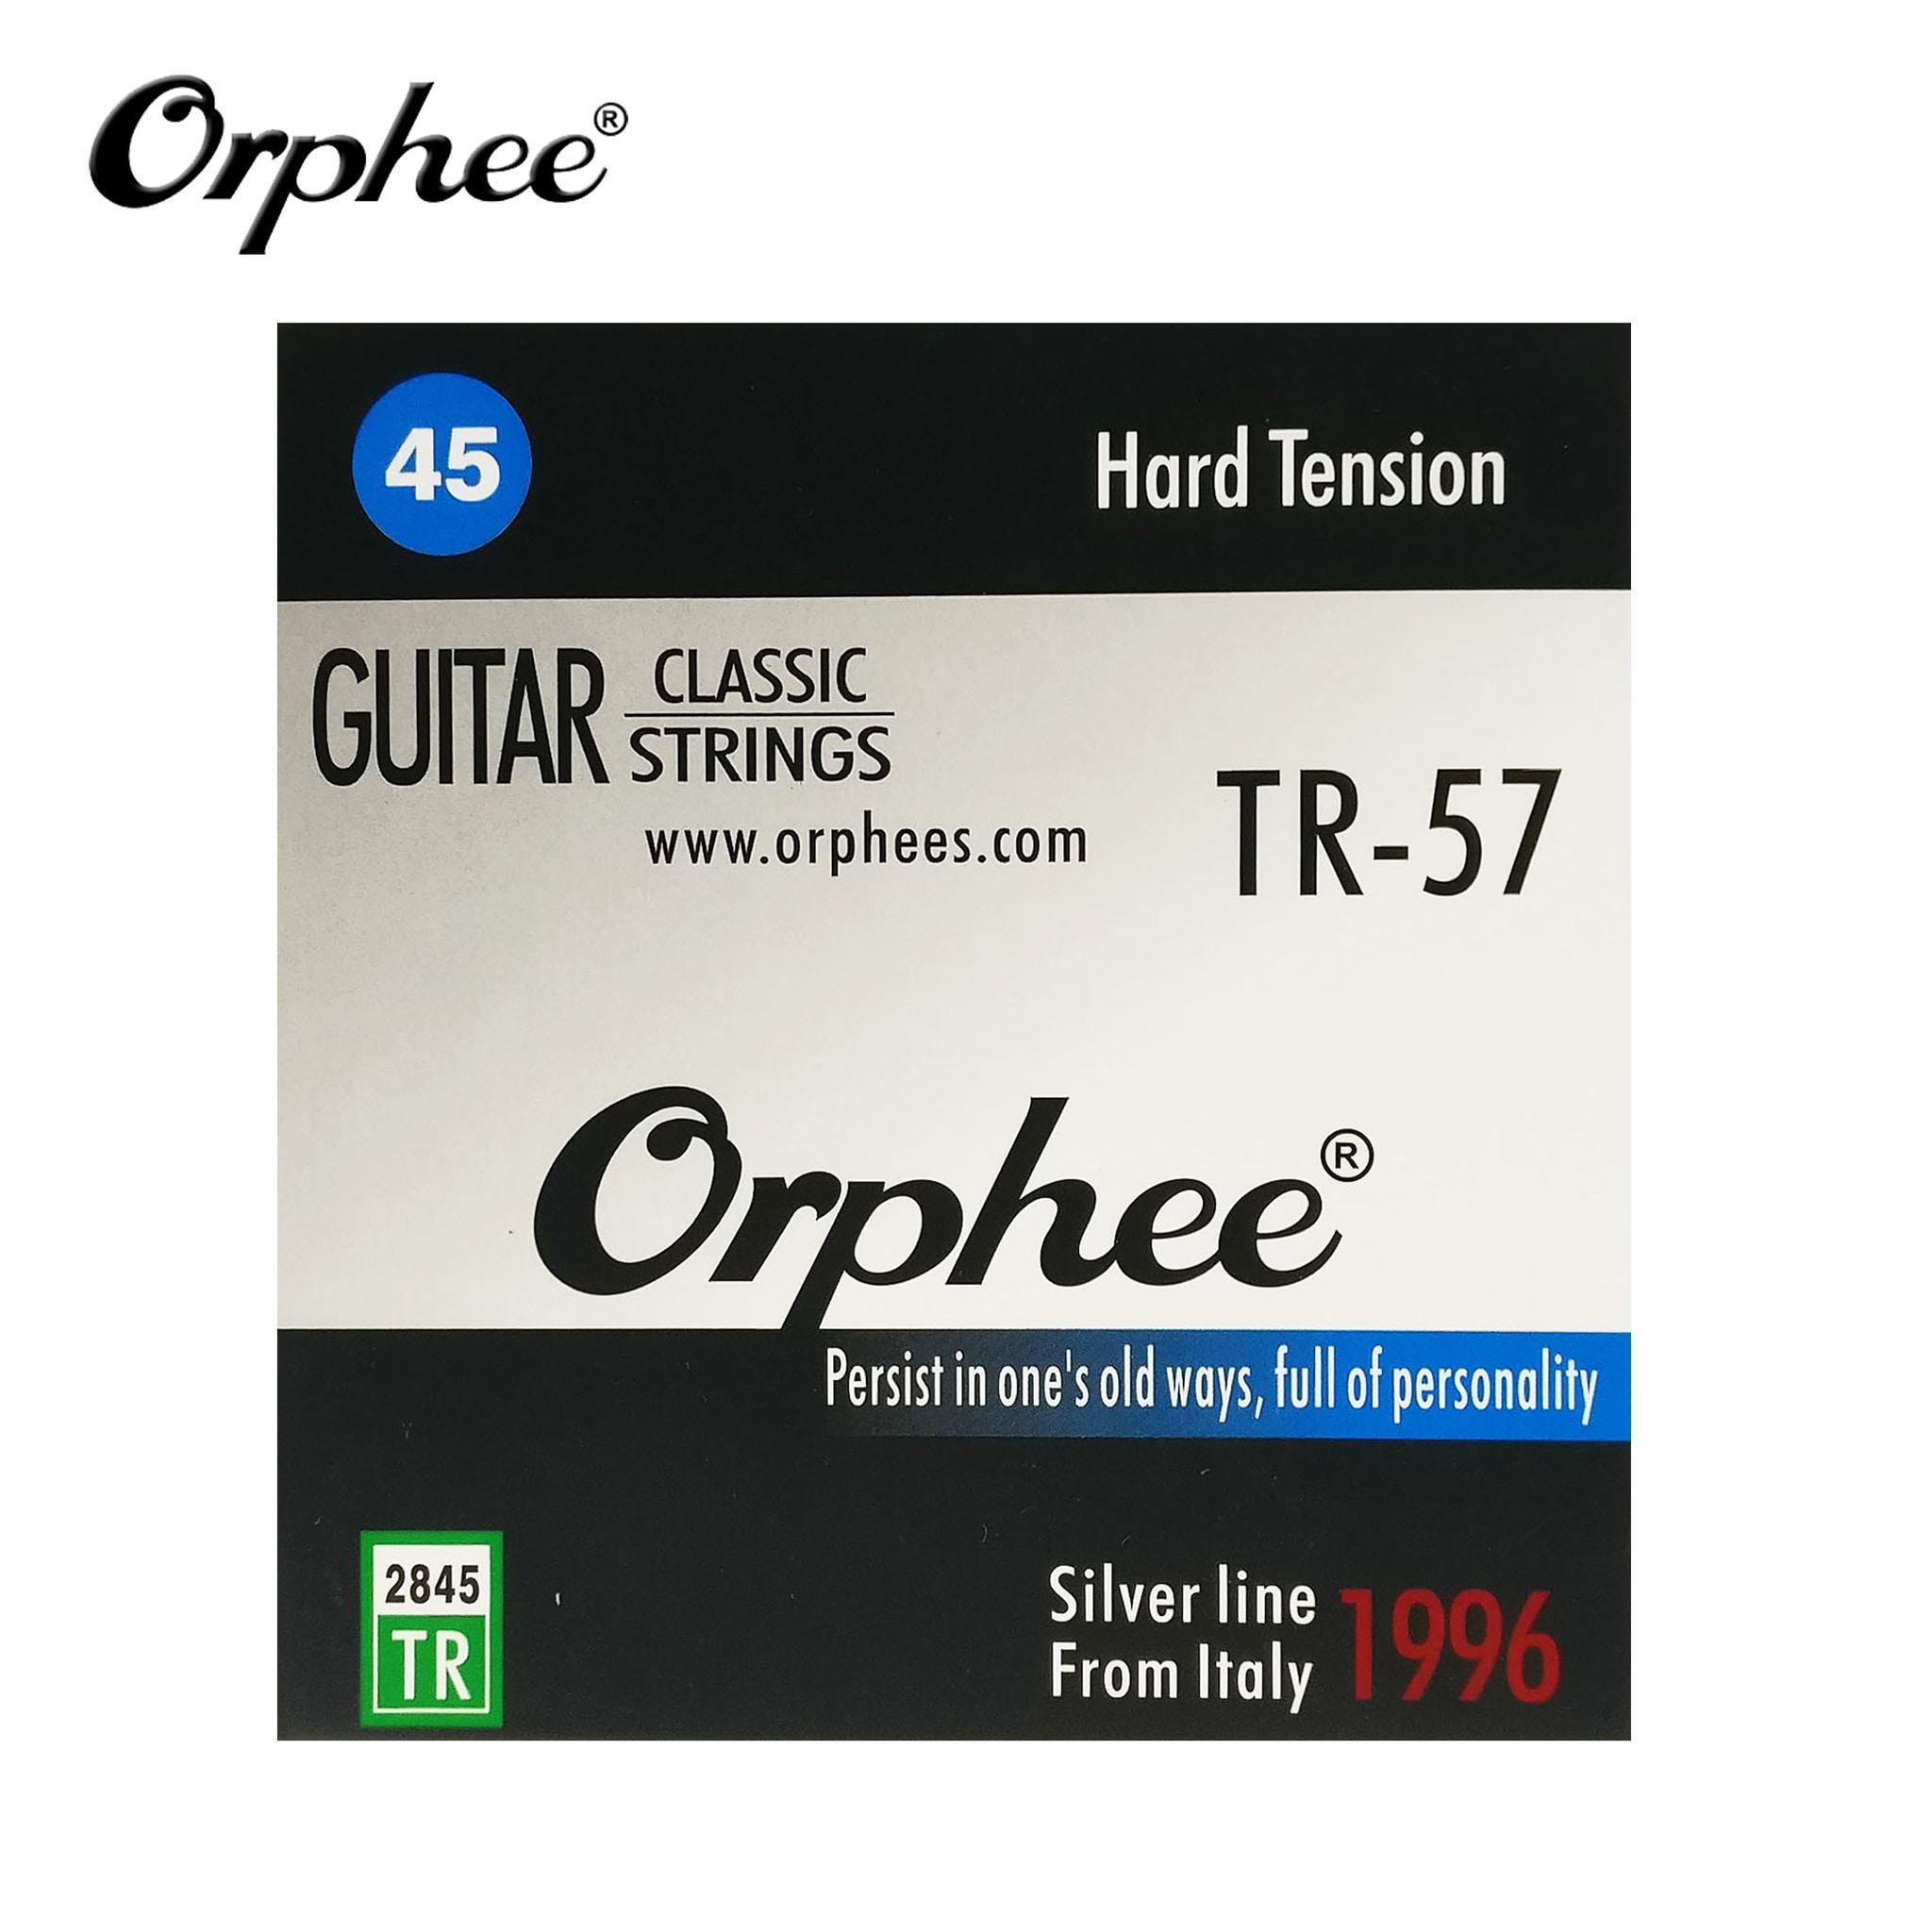 Senar Gitar Klasik Orphee TR - 57 Hard Tension - Blanja.com